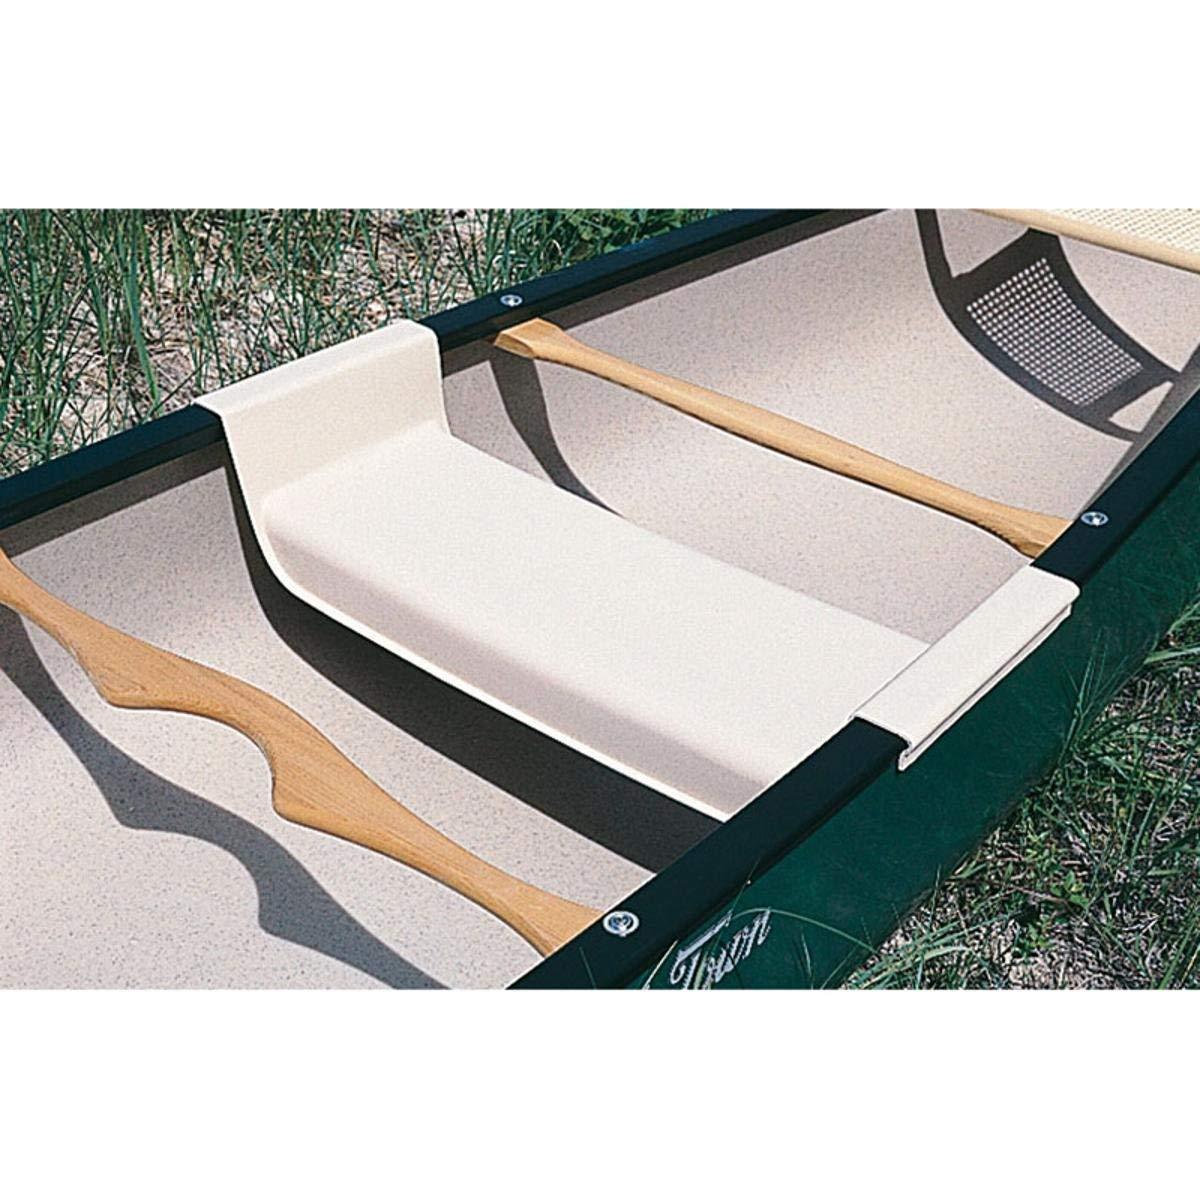 Image of Canoe Seats & Thwarts Carlisle Snap-in Center Canoe Seat (Beige)